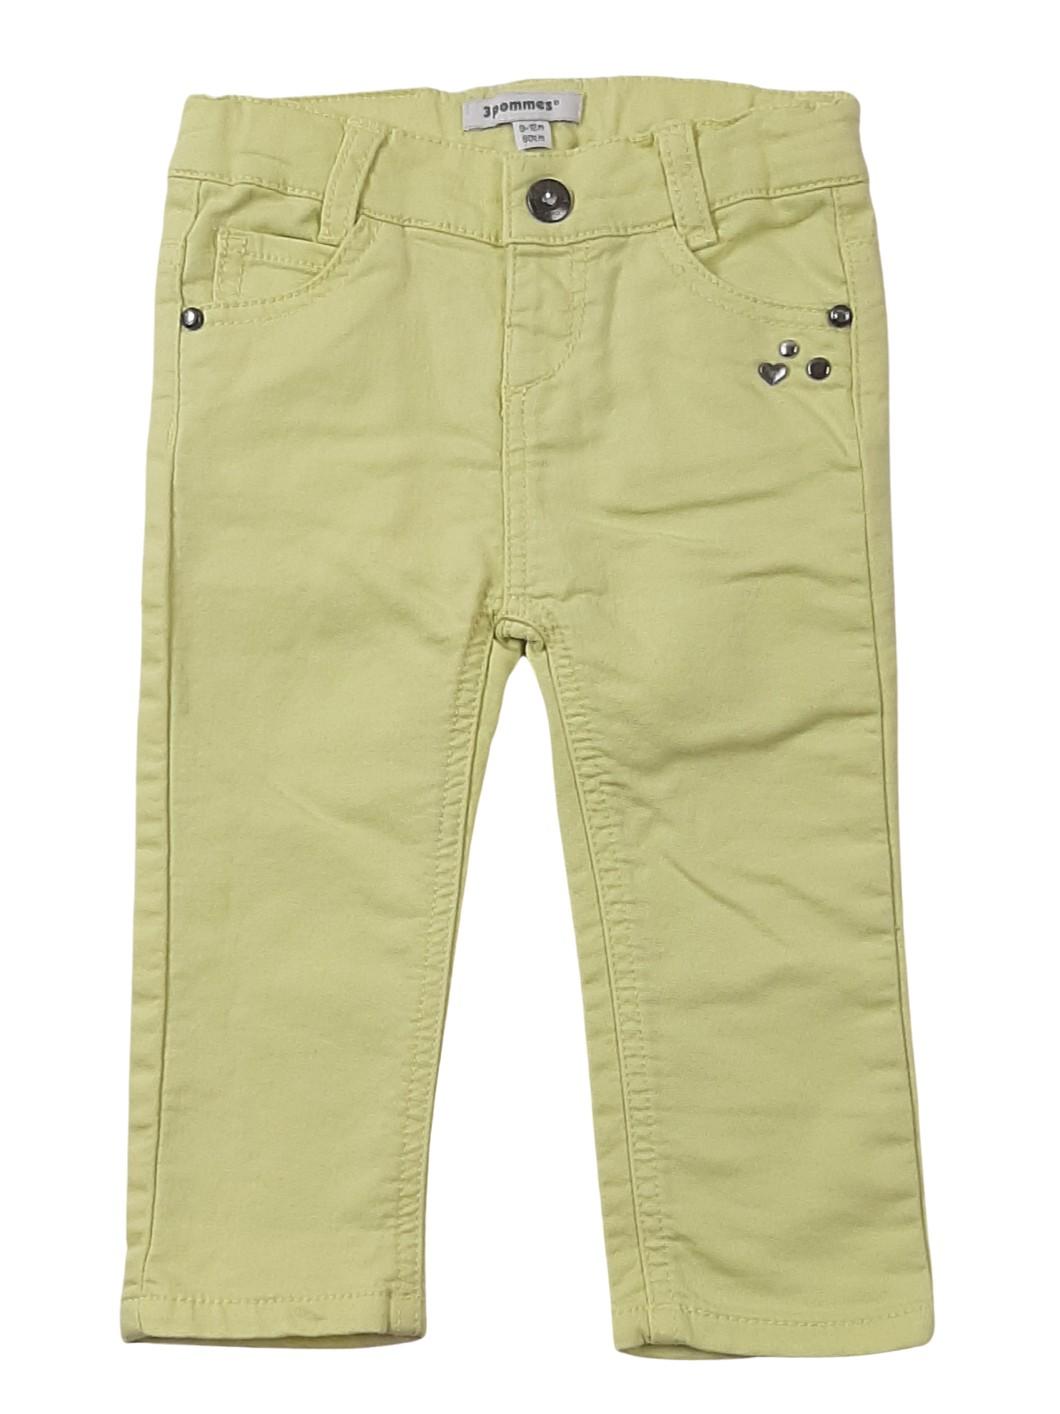 Pantalon sryle jean léger 1